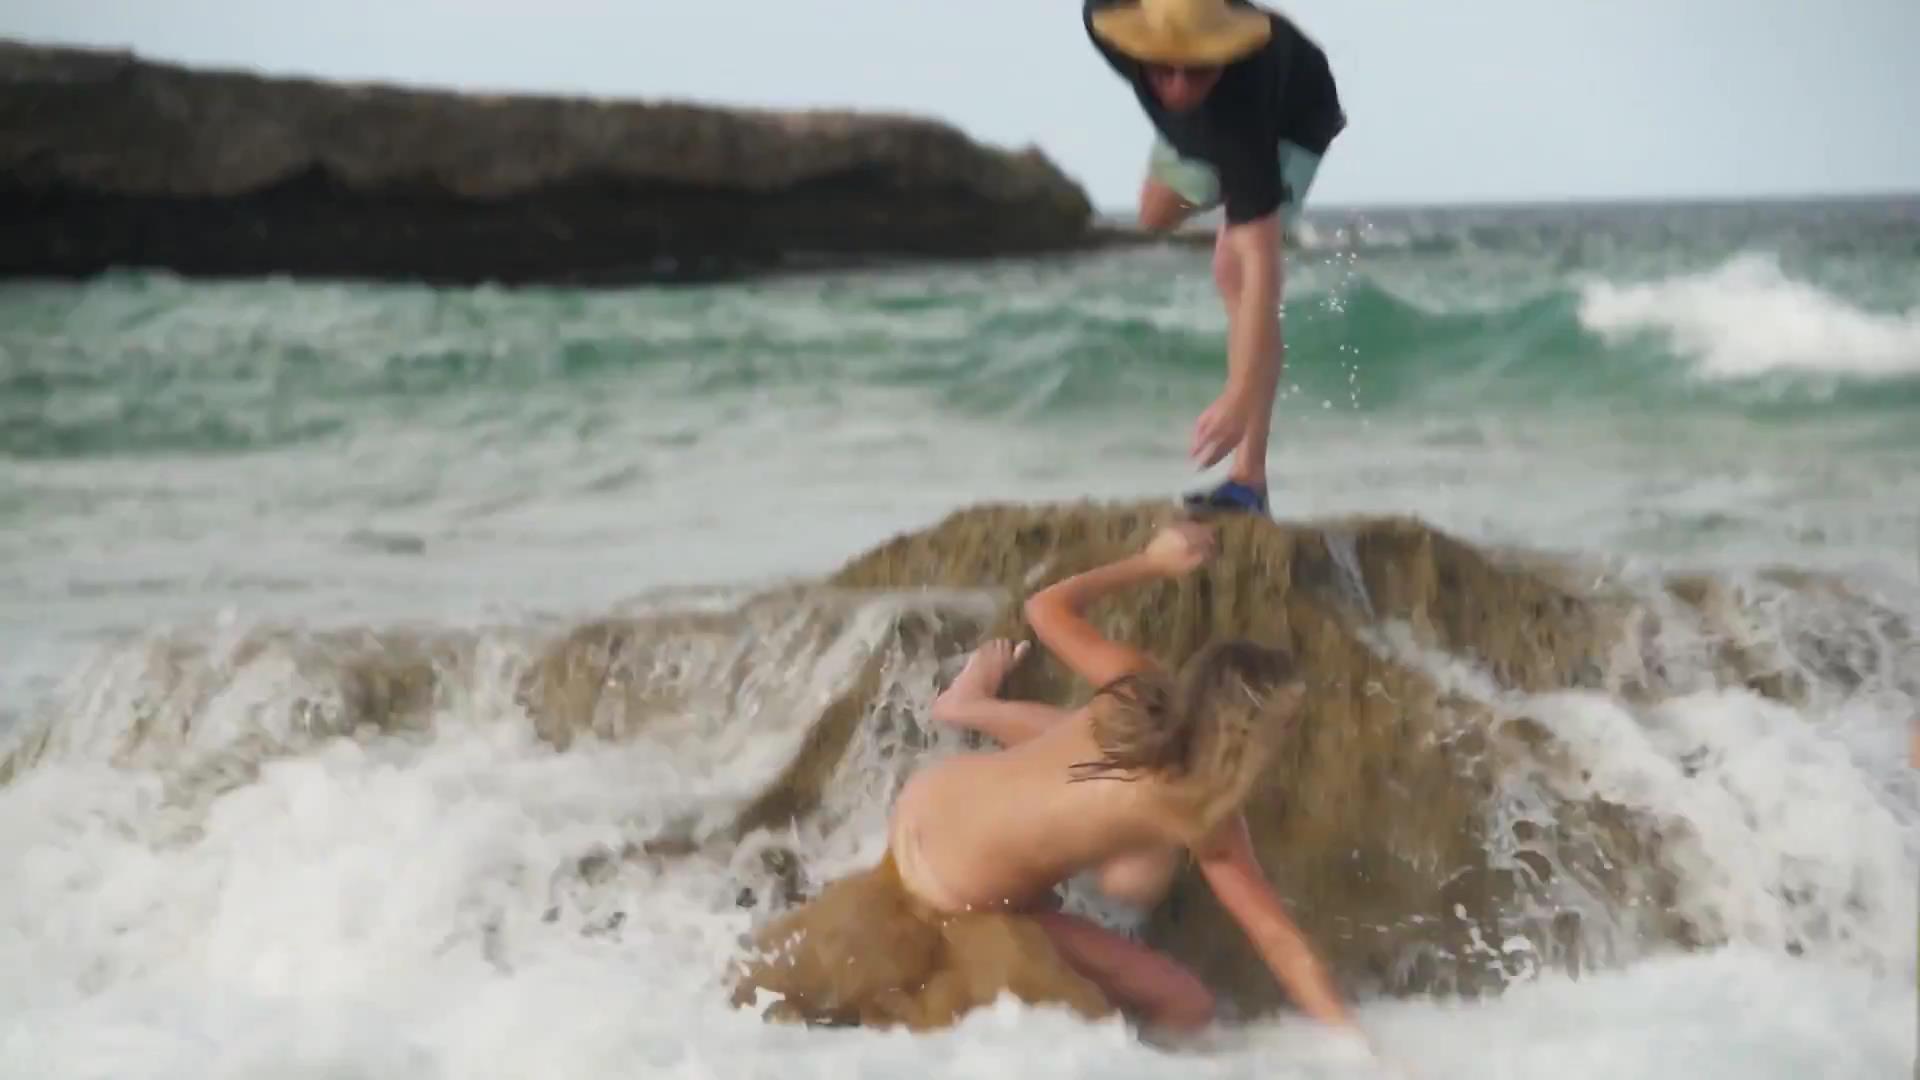 Wave washed off bikini top videos